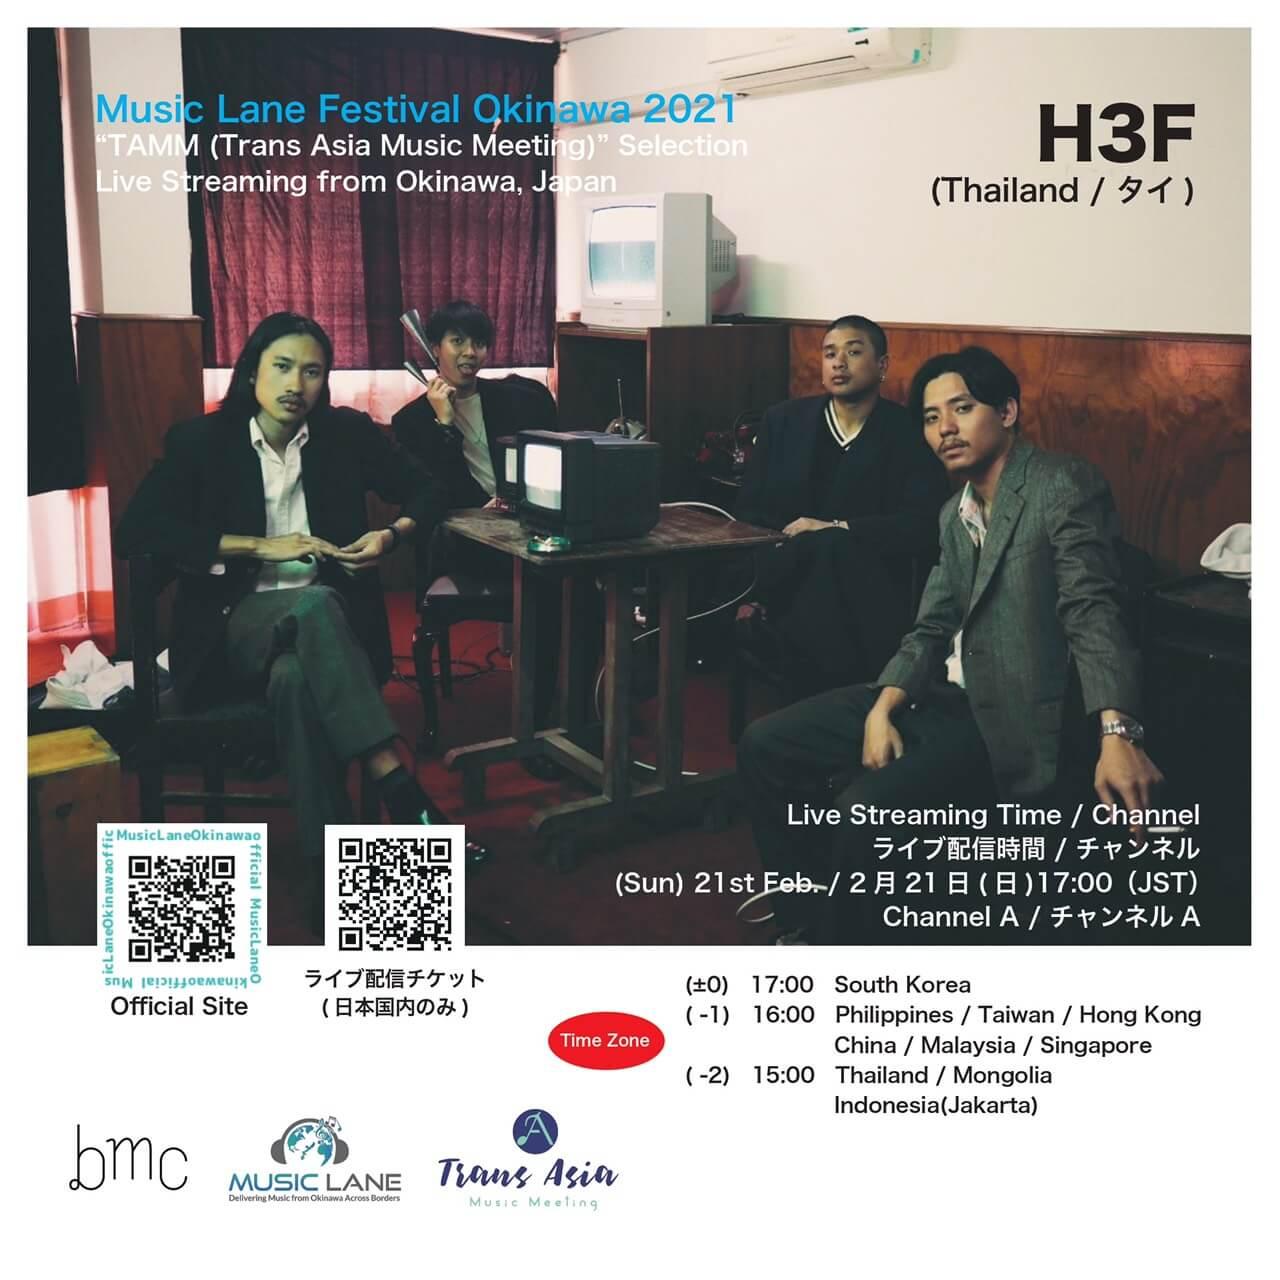 H3F วงดนตรี 4 ชิ้น กับสไตล์เพลงที่พวกเขาบัญญัติไว้ว่า คือ 'Cheesy lyrics, Sloppy Groove'